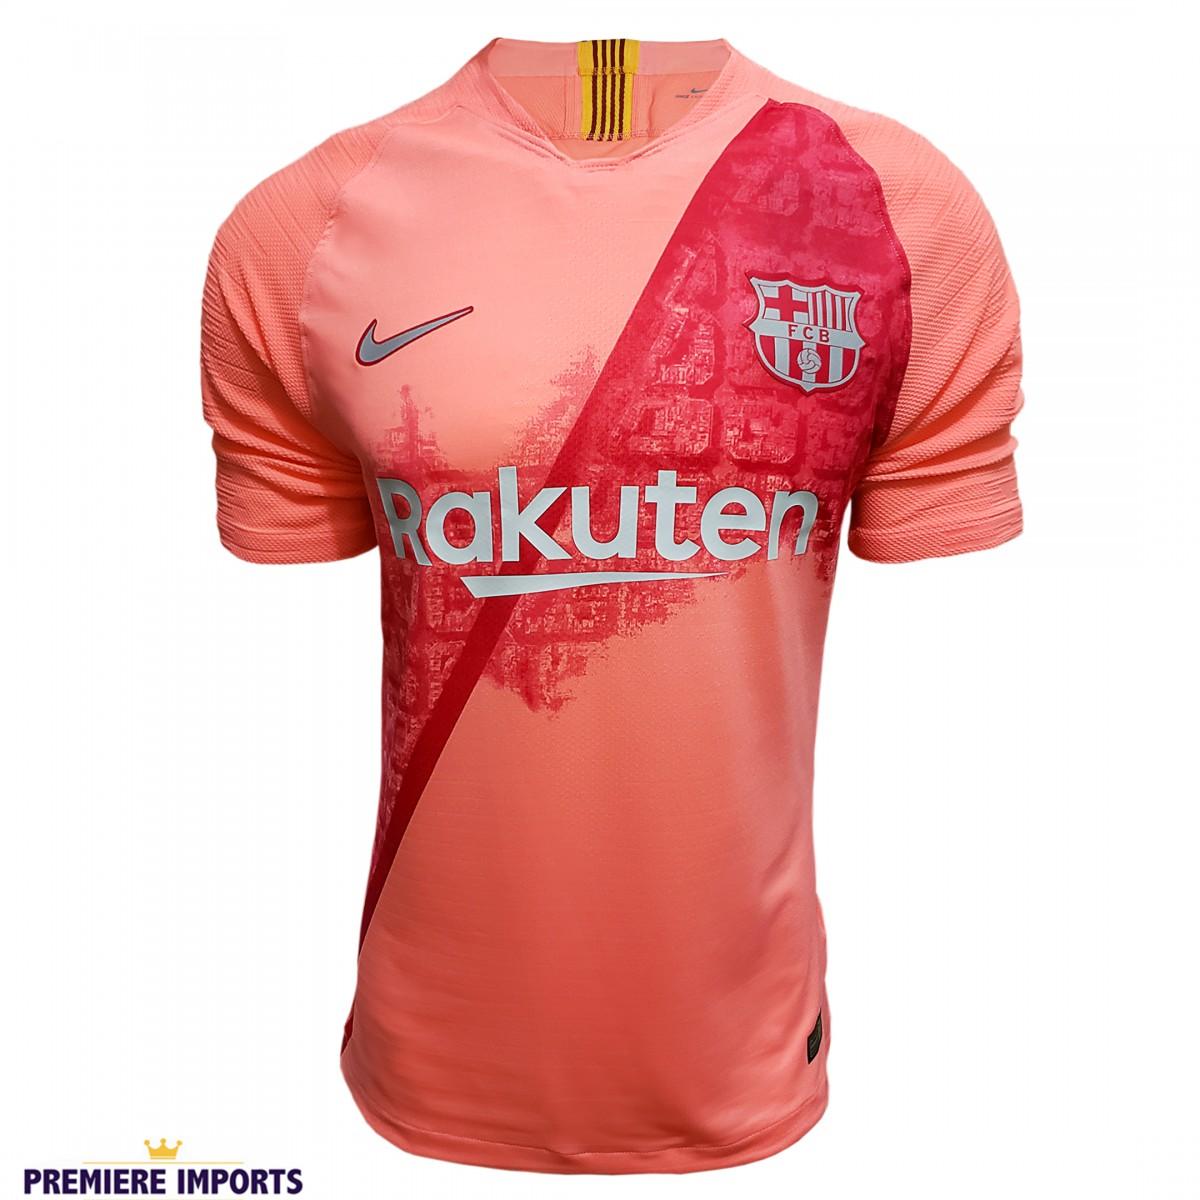 Foto 1 - Camisa Nike Barcelona Third 2018-19